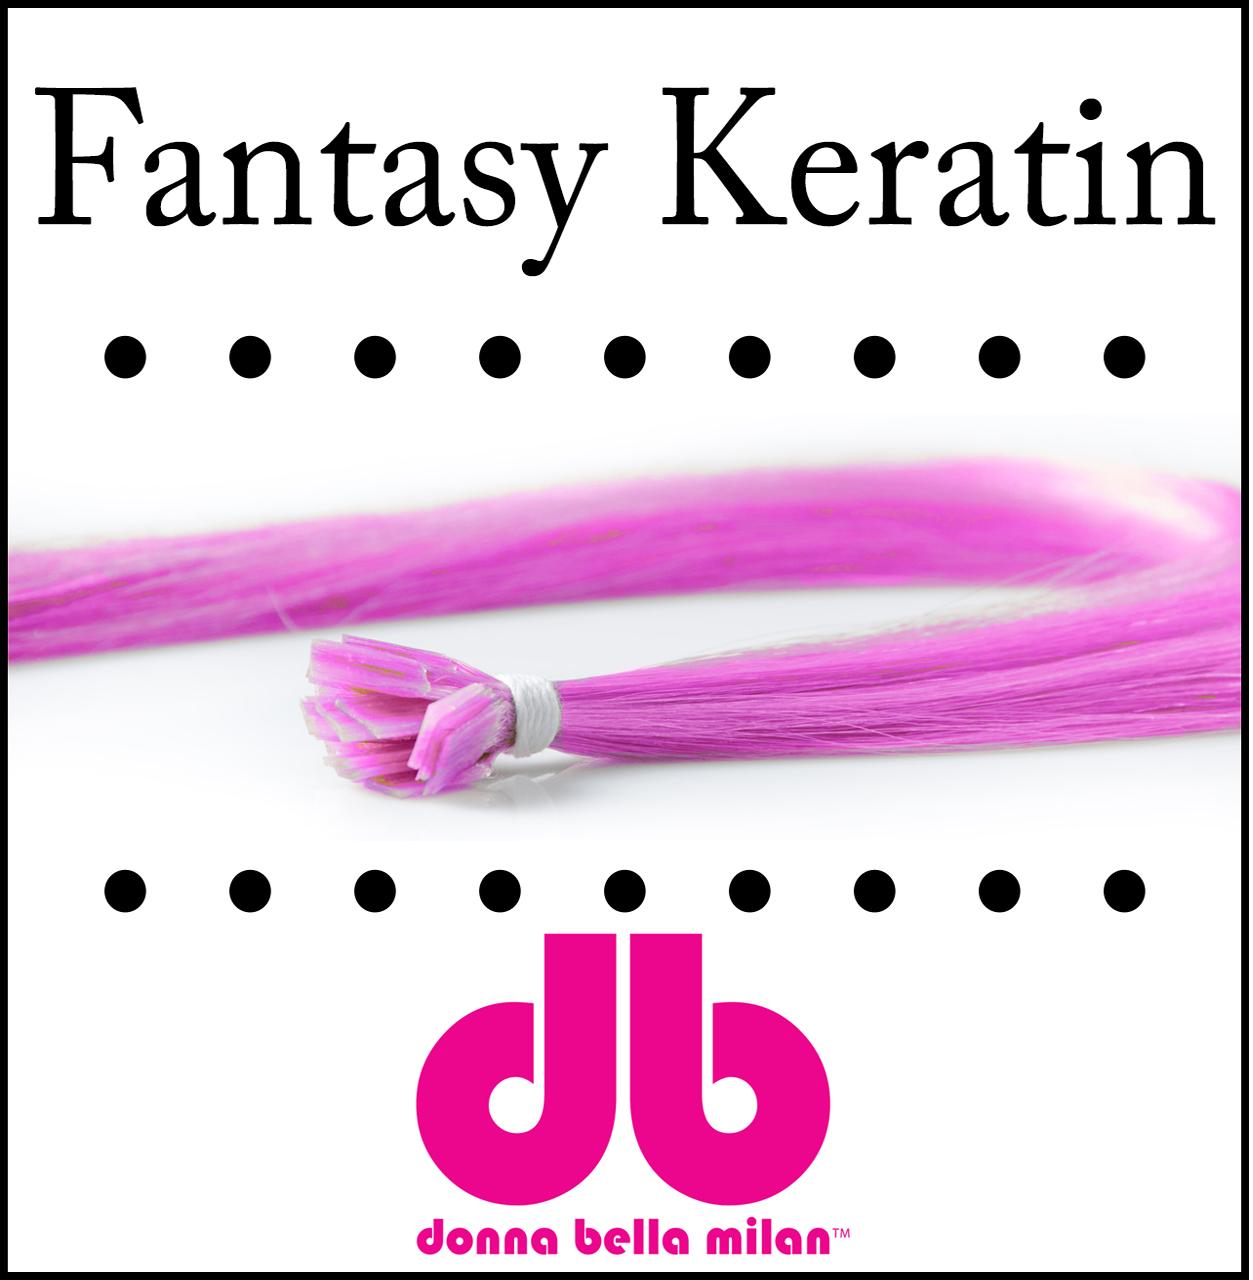 "Donna Bella Kera-link Fantasy fusion, 20 strands, 18"""